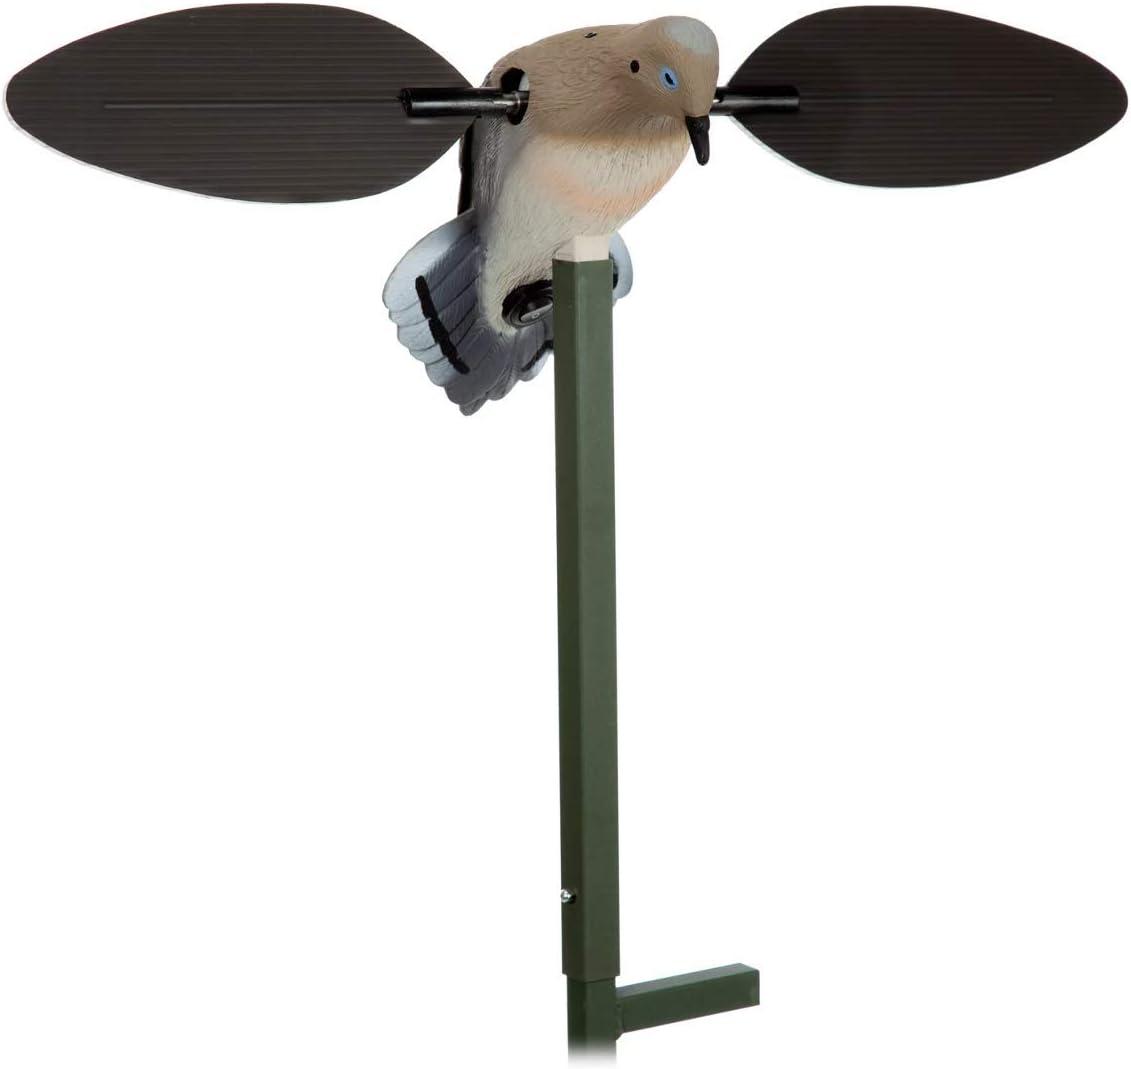 Amazon.com : Mojo Outdoors Voodoo Dove Decoy - Motion Dove Decoy ...